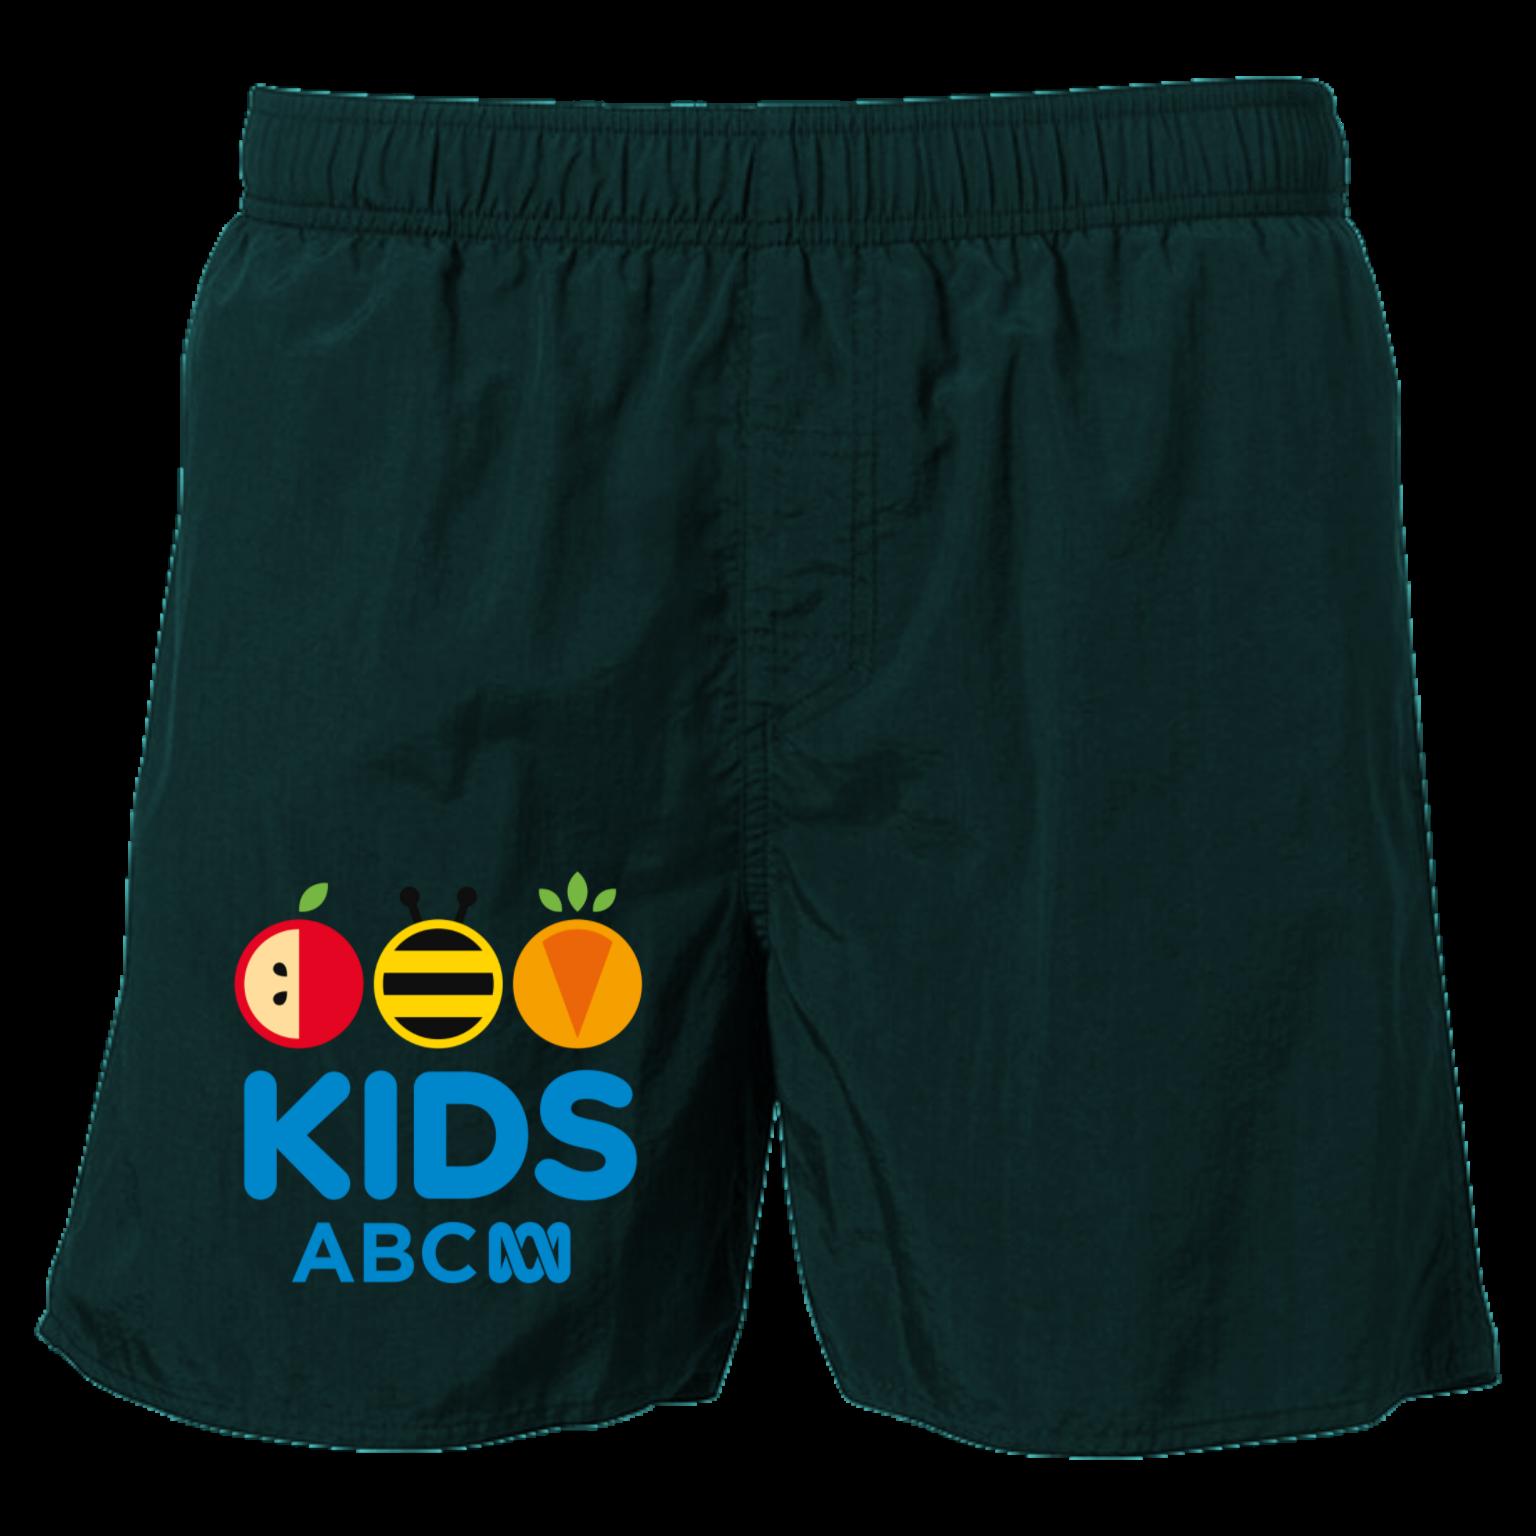 ABC Kids Men's Swim Shorts Size M Bottle.png